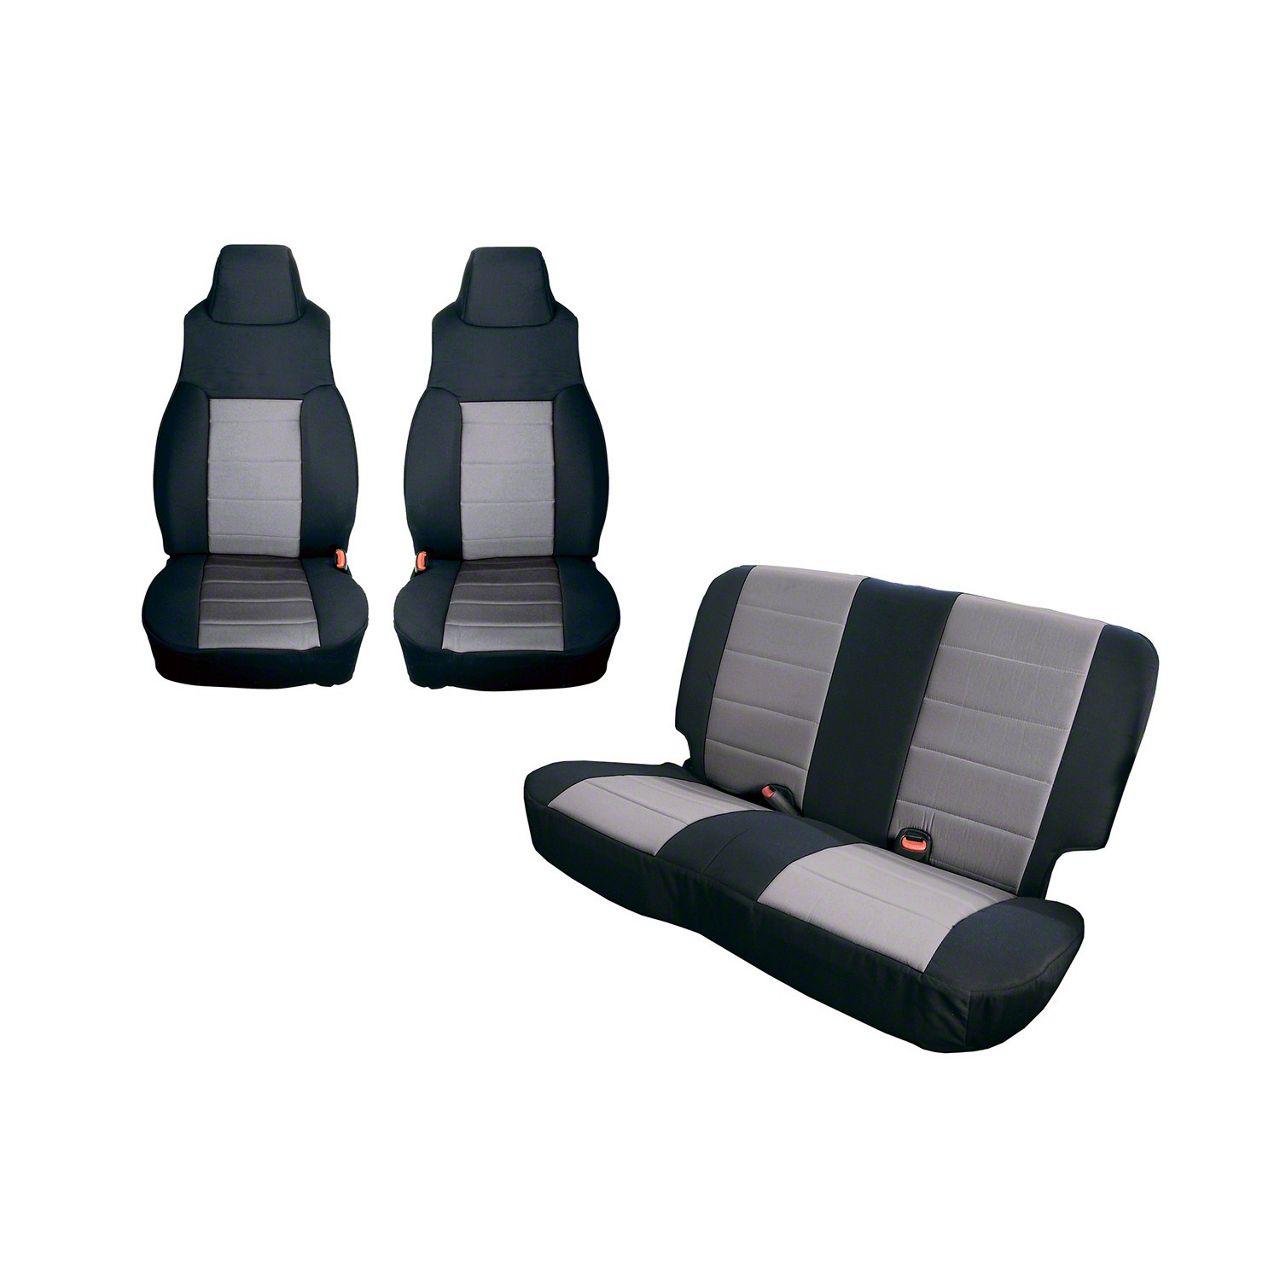 Rugged Ridge Seat Cover Kit - Black/Gray (91-95 Jeep Wrangler YJ)